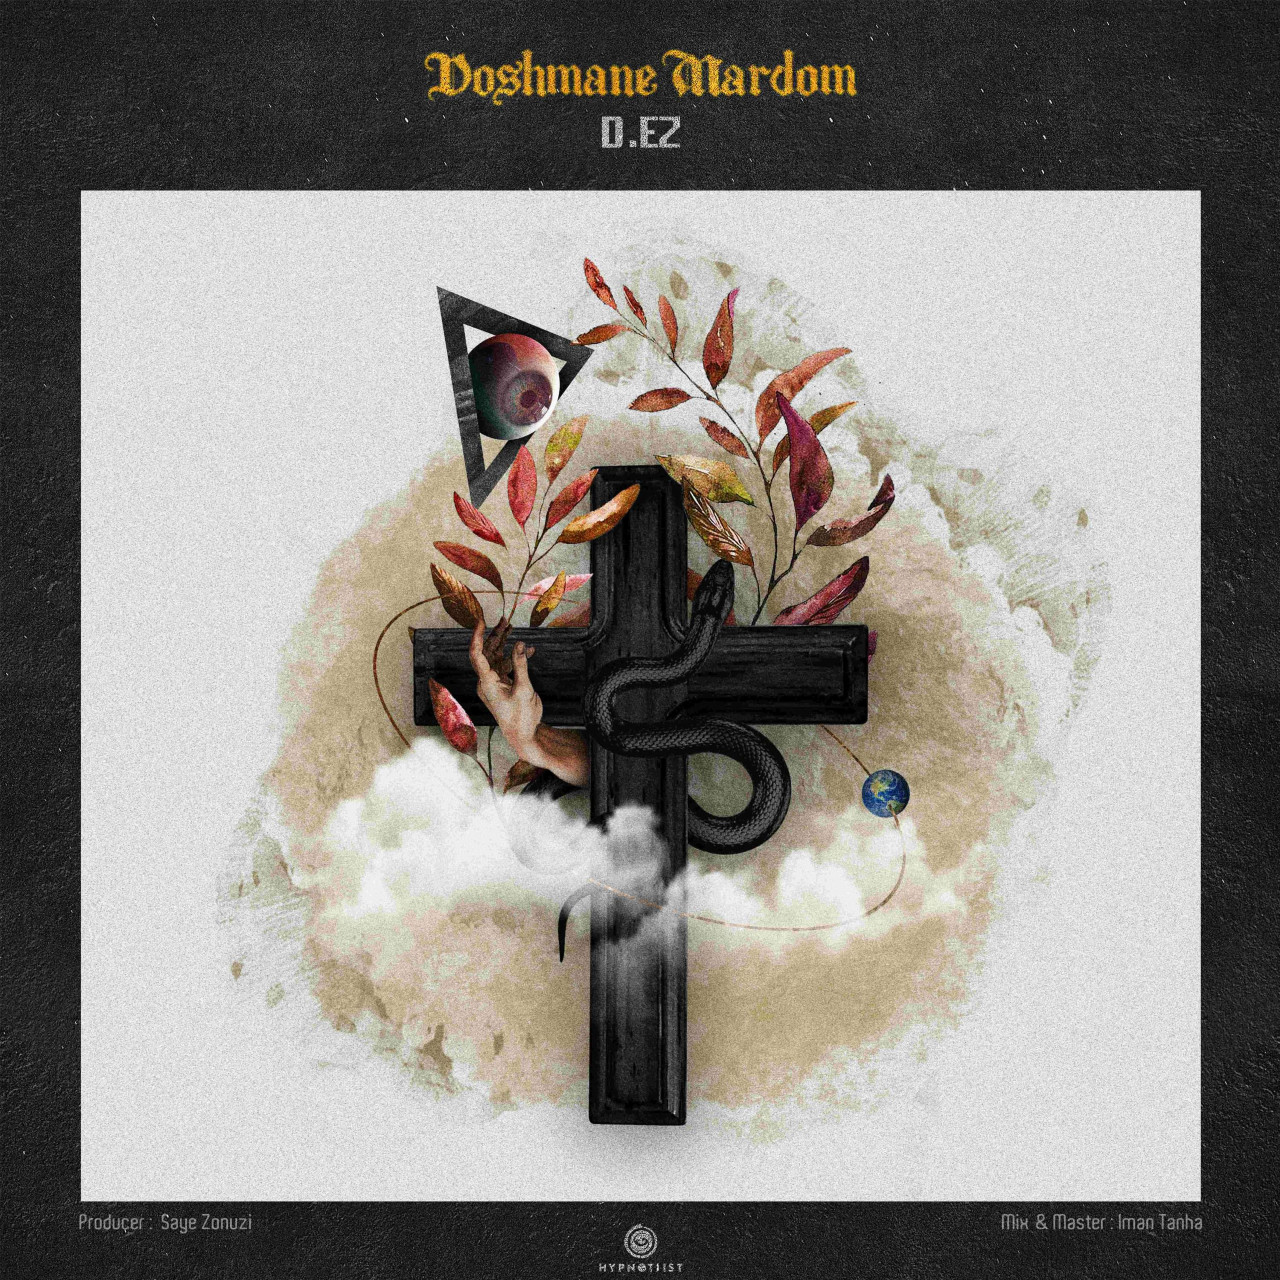 D.Ez - Doshmane Mardom